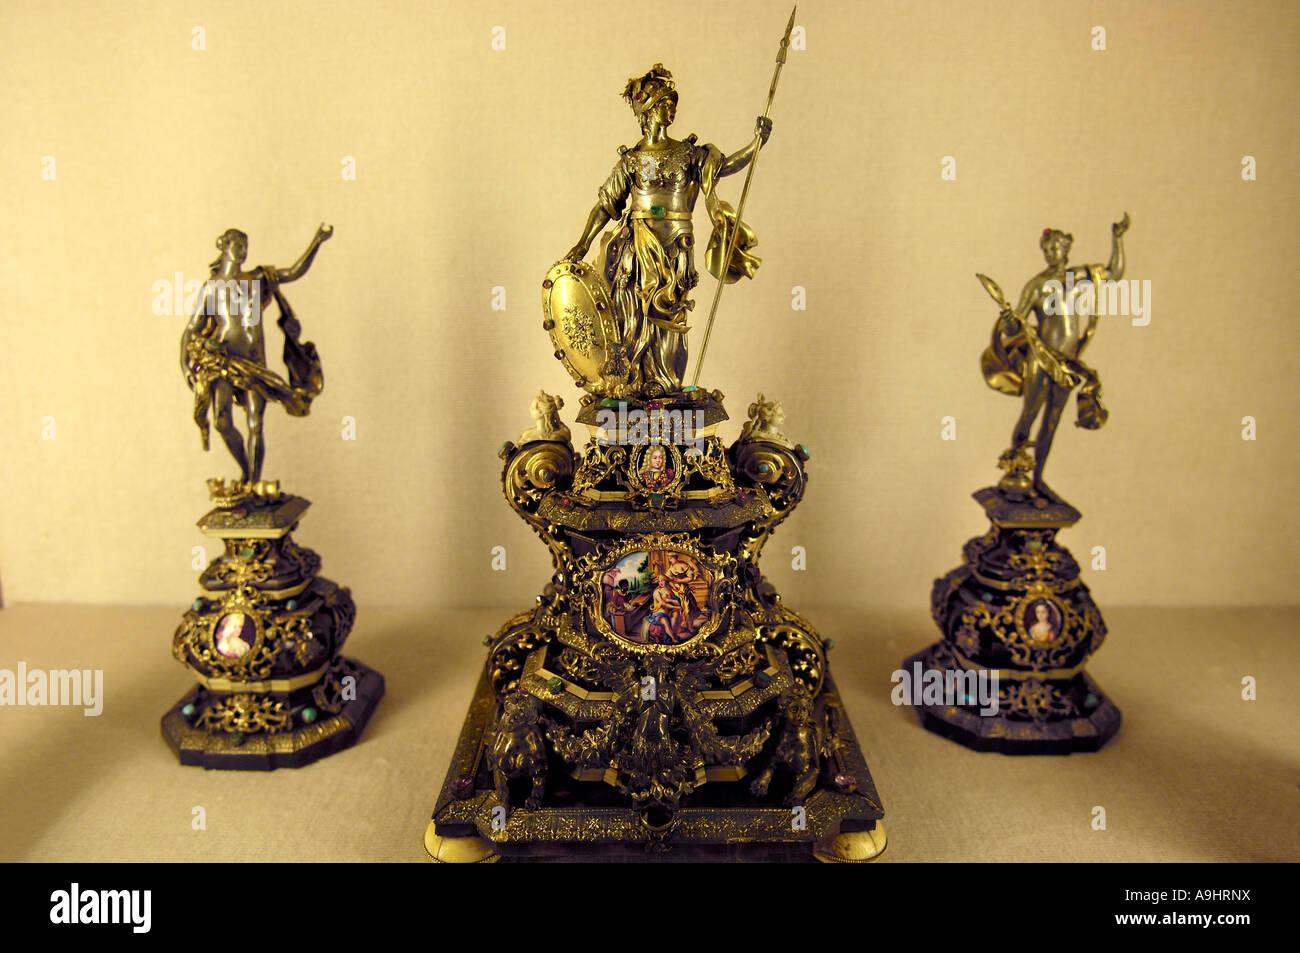 Little golden figurines, Residenz, treasury, Munich, Bavaria, Germany - Stock Image